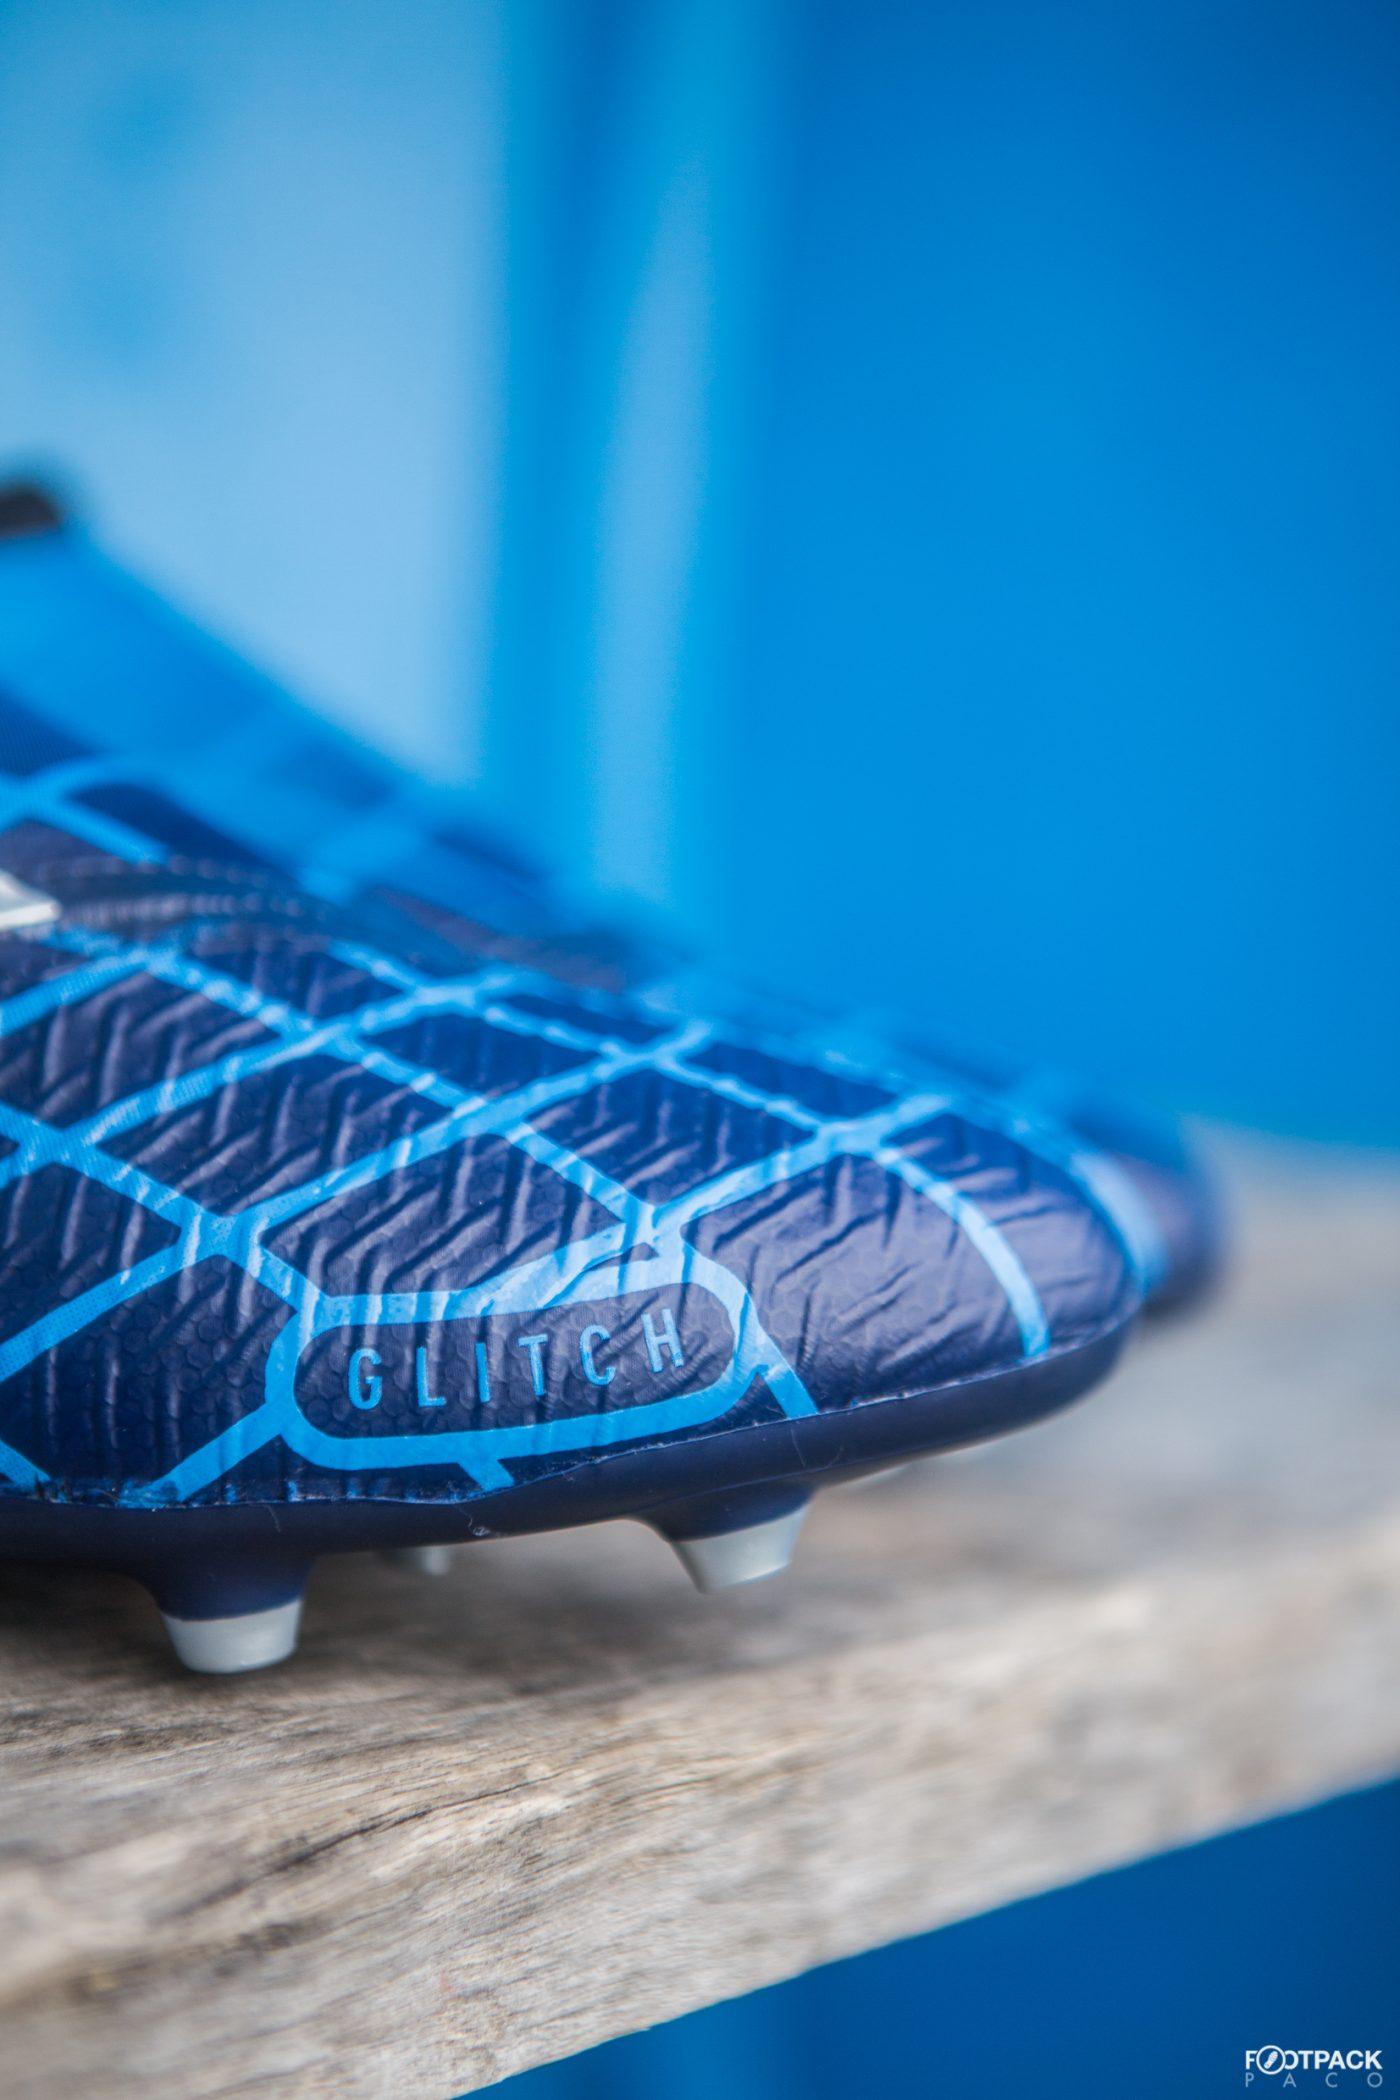 adidas-glitch-classic-pack-skin-F50-araignee-2005-footpack-1